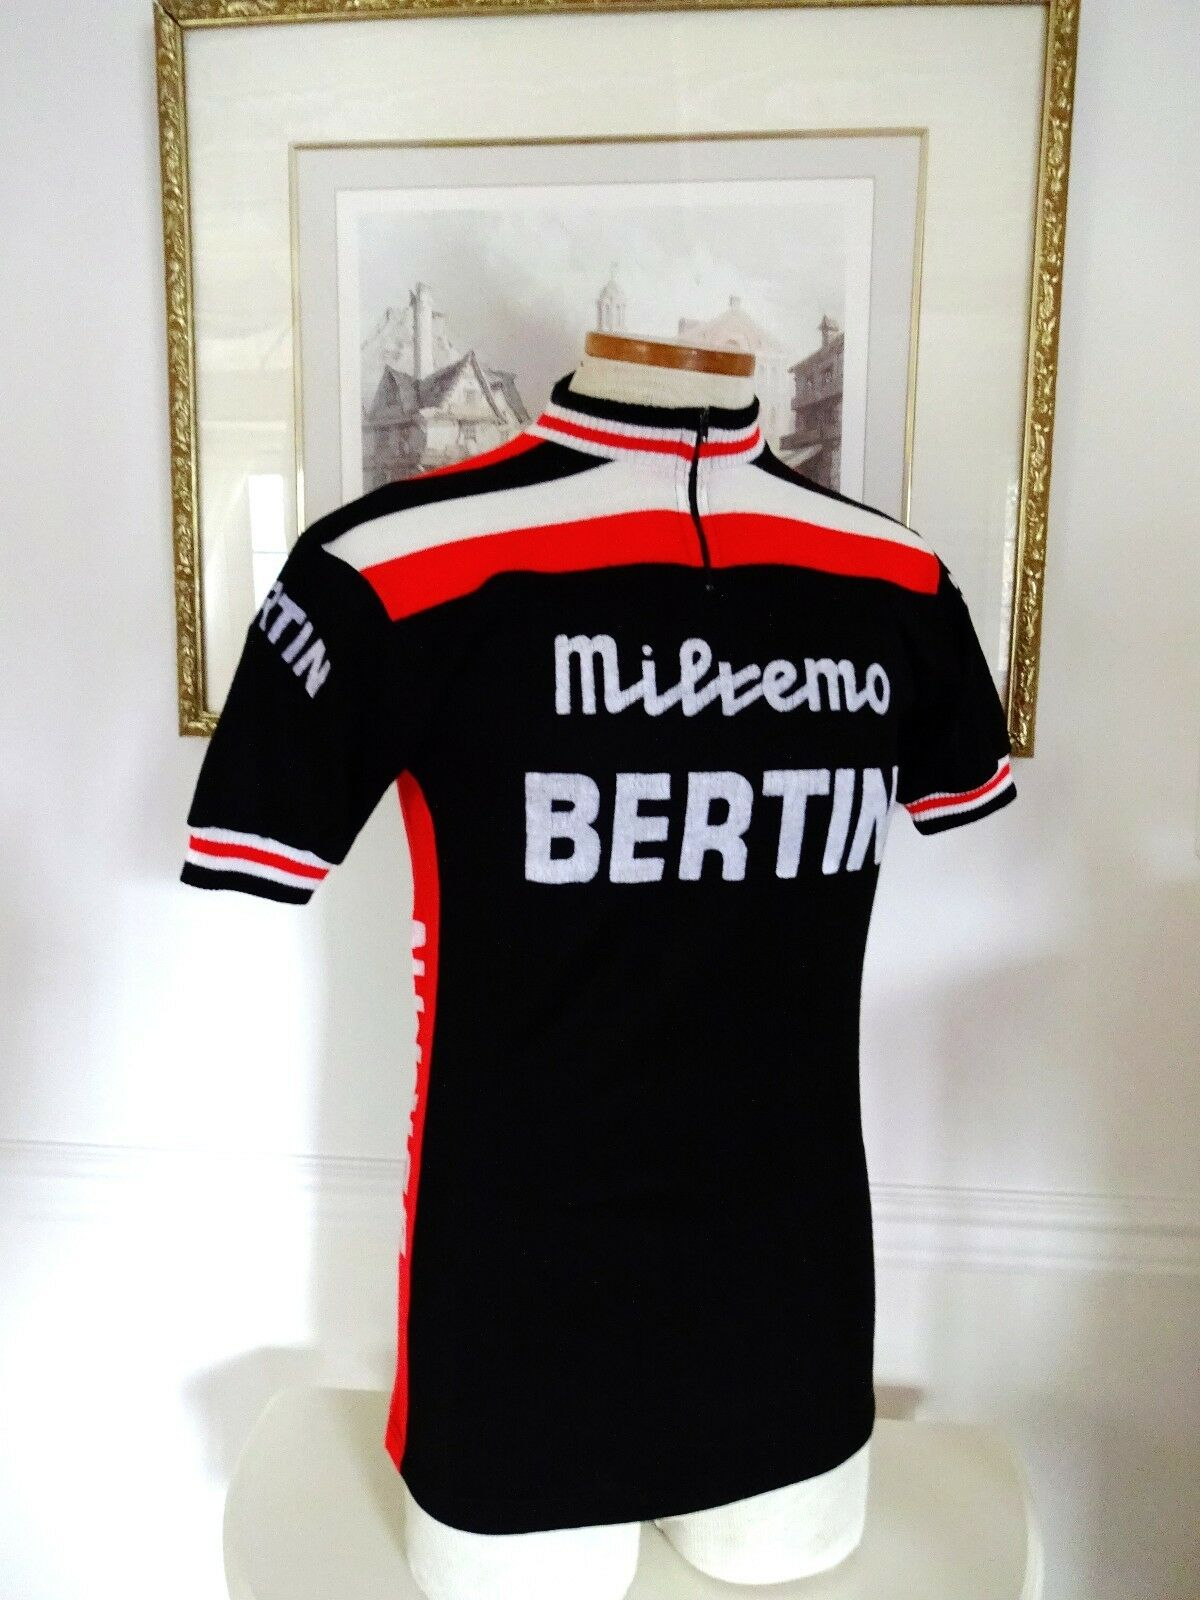 1964 BERTIN CYCLING TEAM SHORT SLEEVE CYCLING  JERSEY - FRANCE - MEDIUM  no minimum